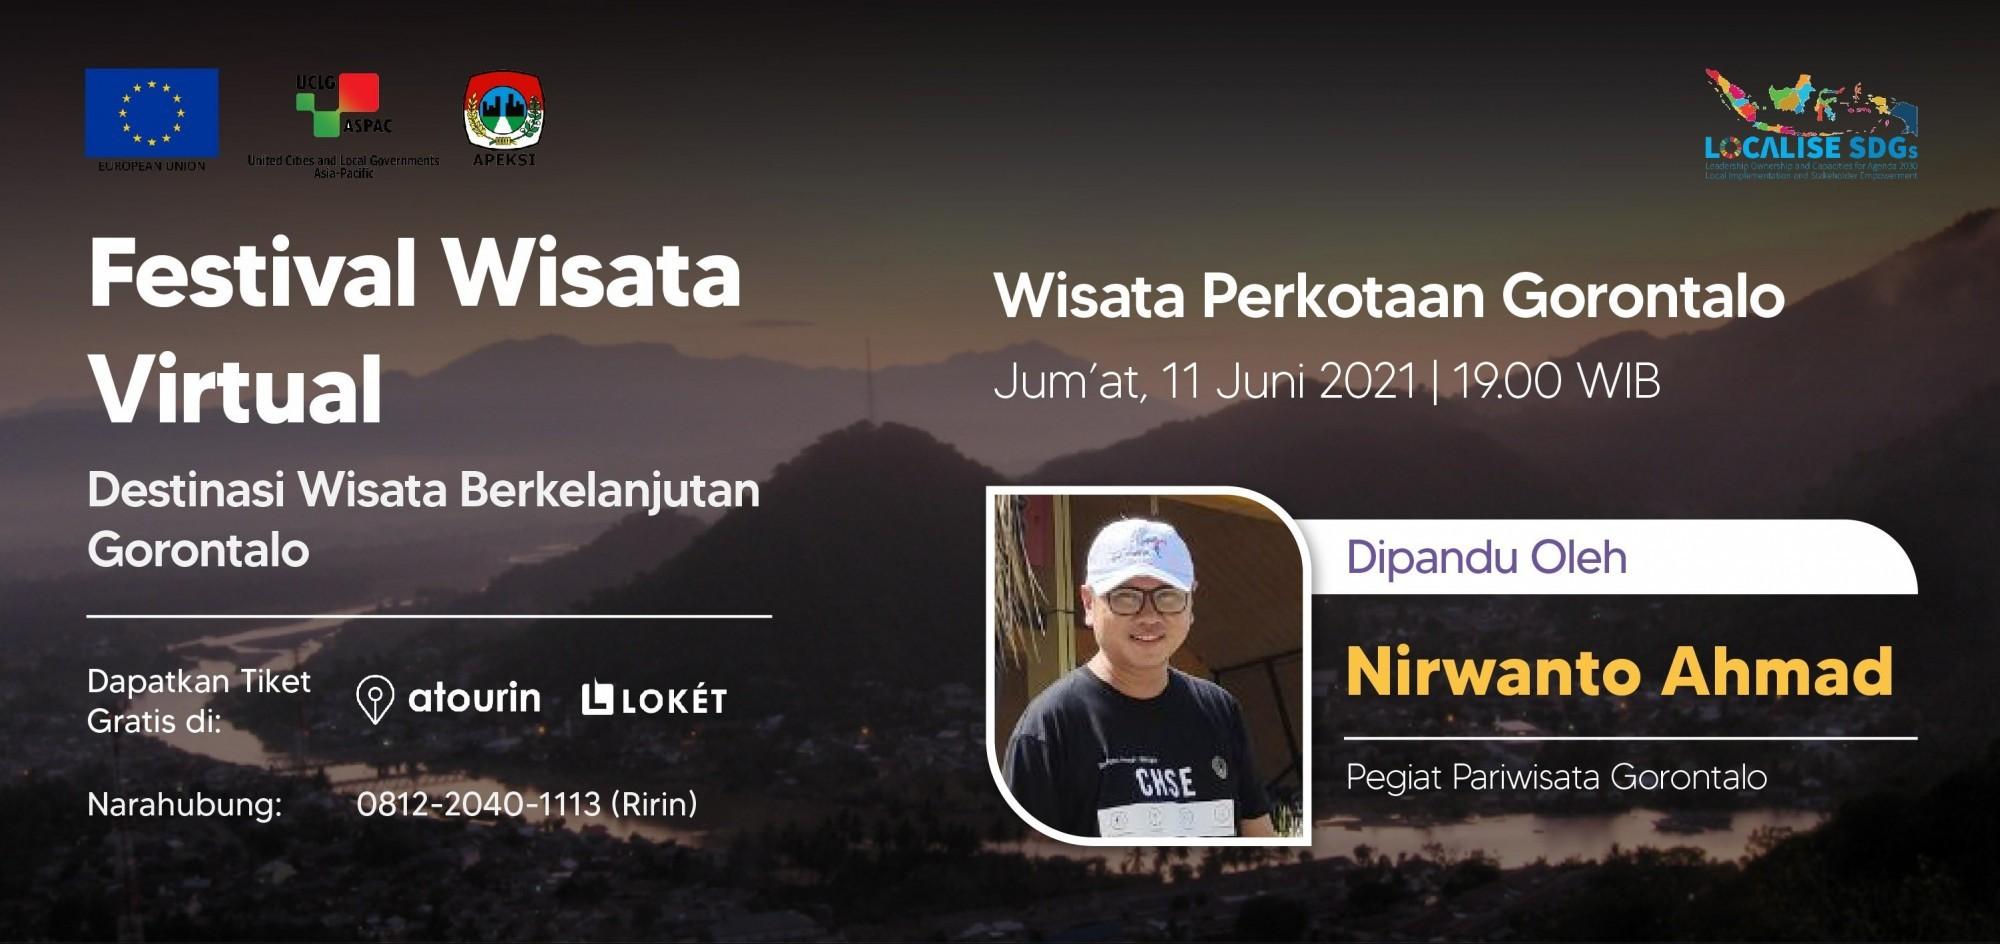 Wisata Perkotaan Gorontalo - Festival Wisata Virtual